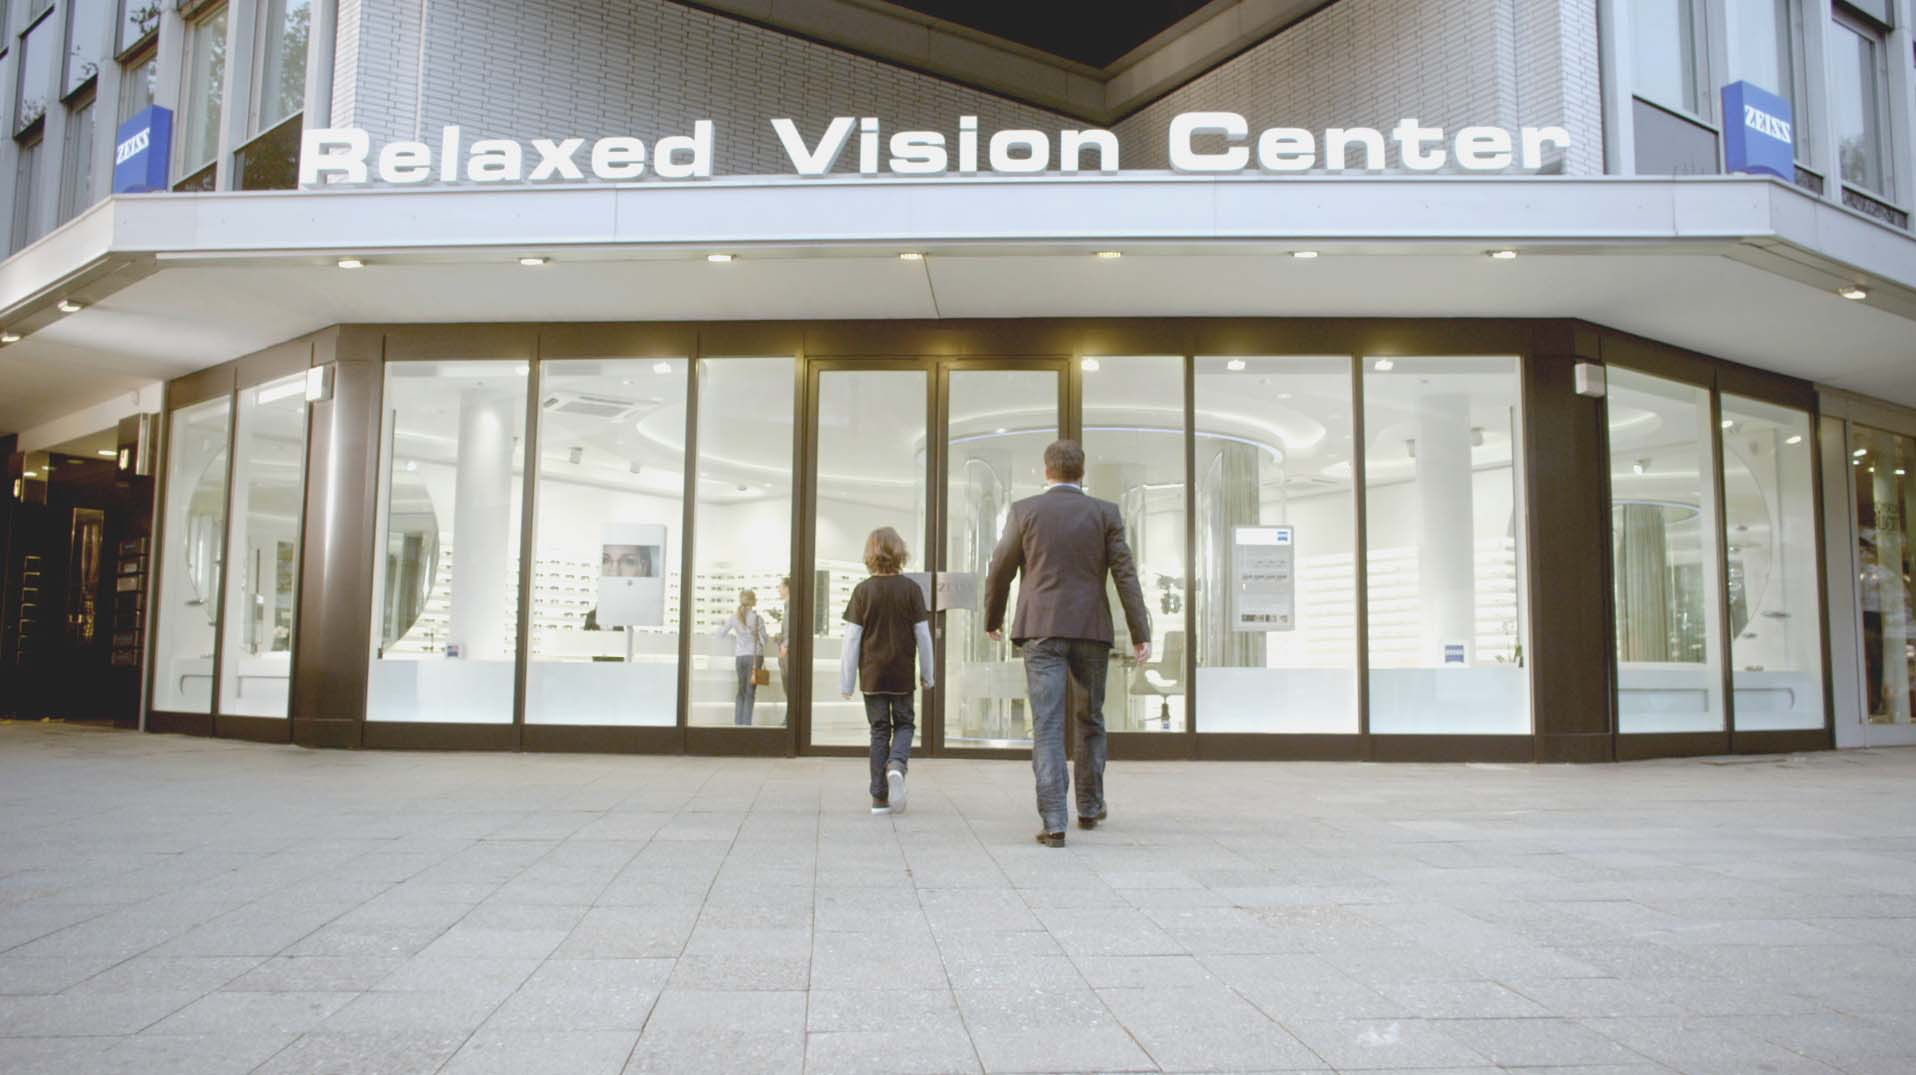 imagefilm, storytelling, konzeption, conception, emotional, carl zeiss vision international, munich, muenchen, visuarte